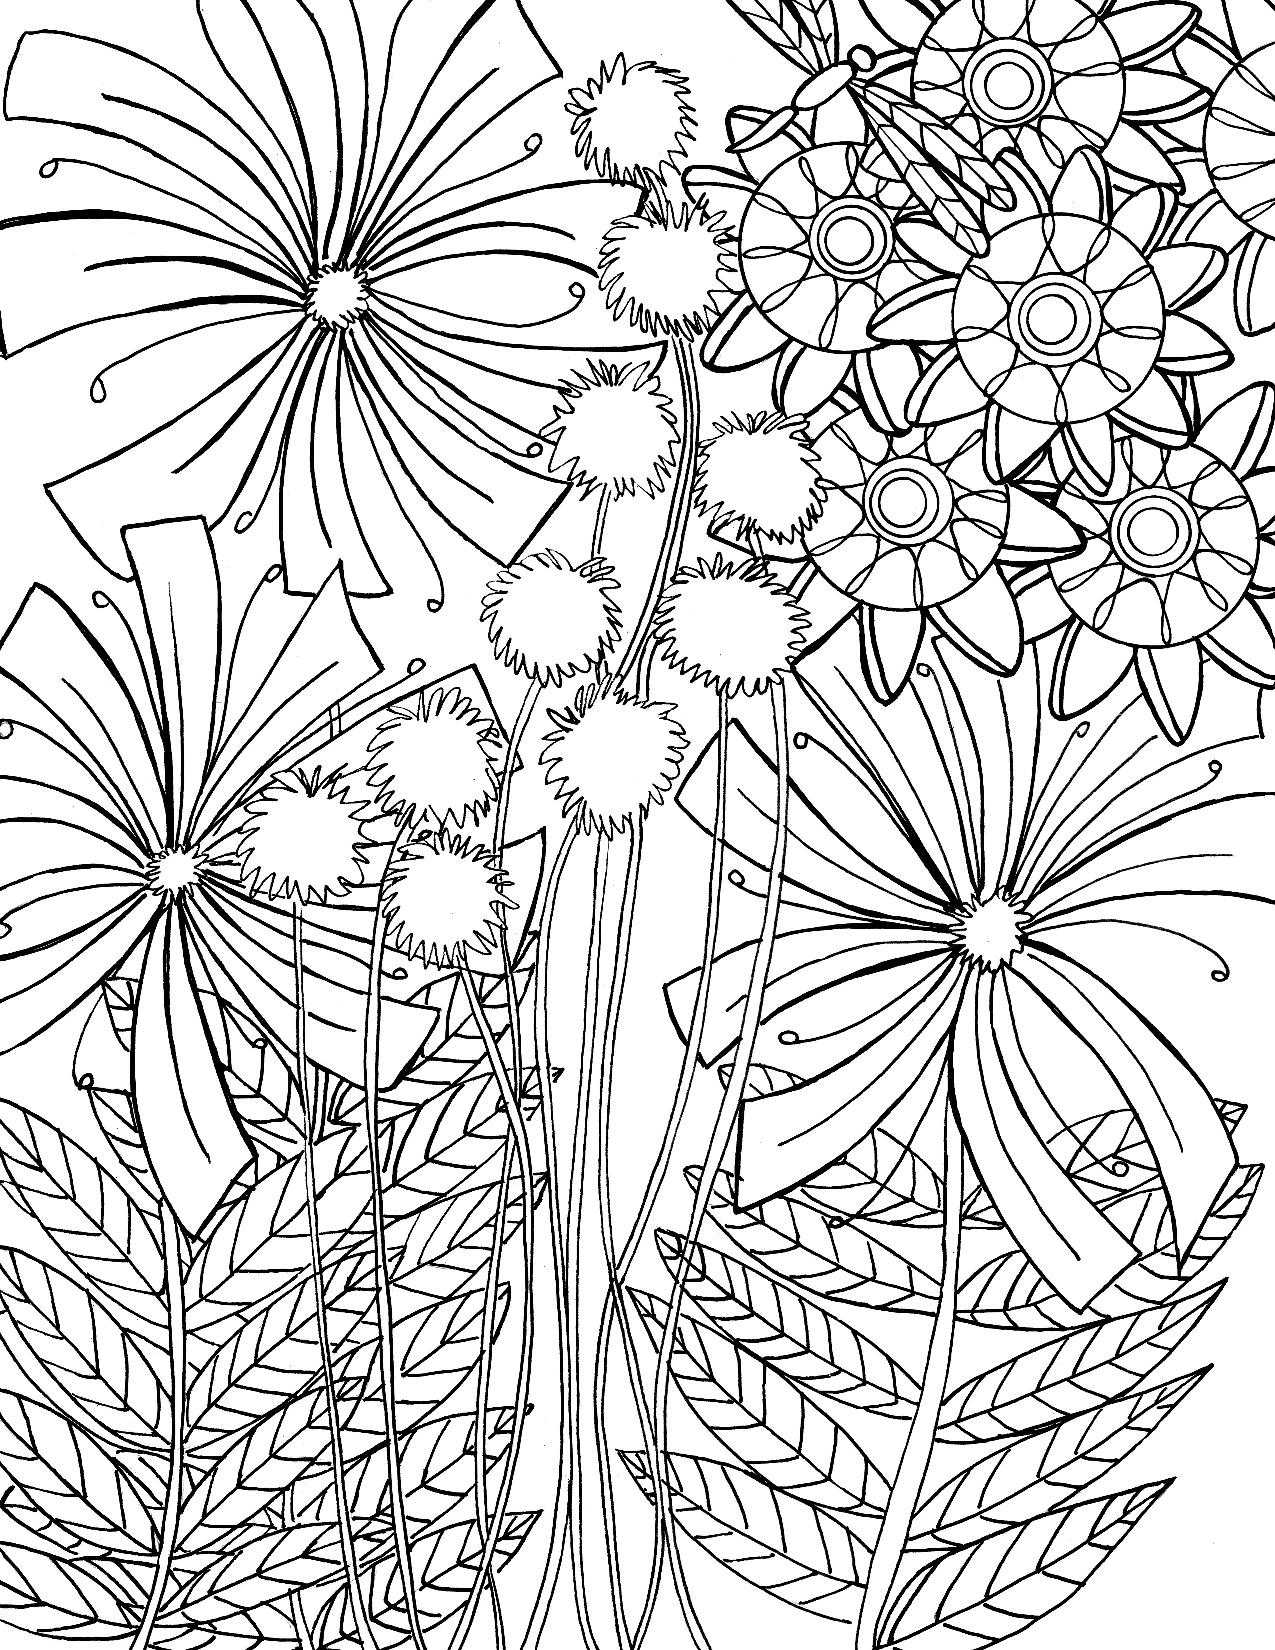 Одуванчики - Цветы - Раскраски антистресс